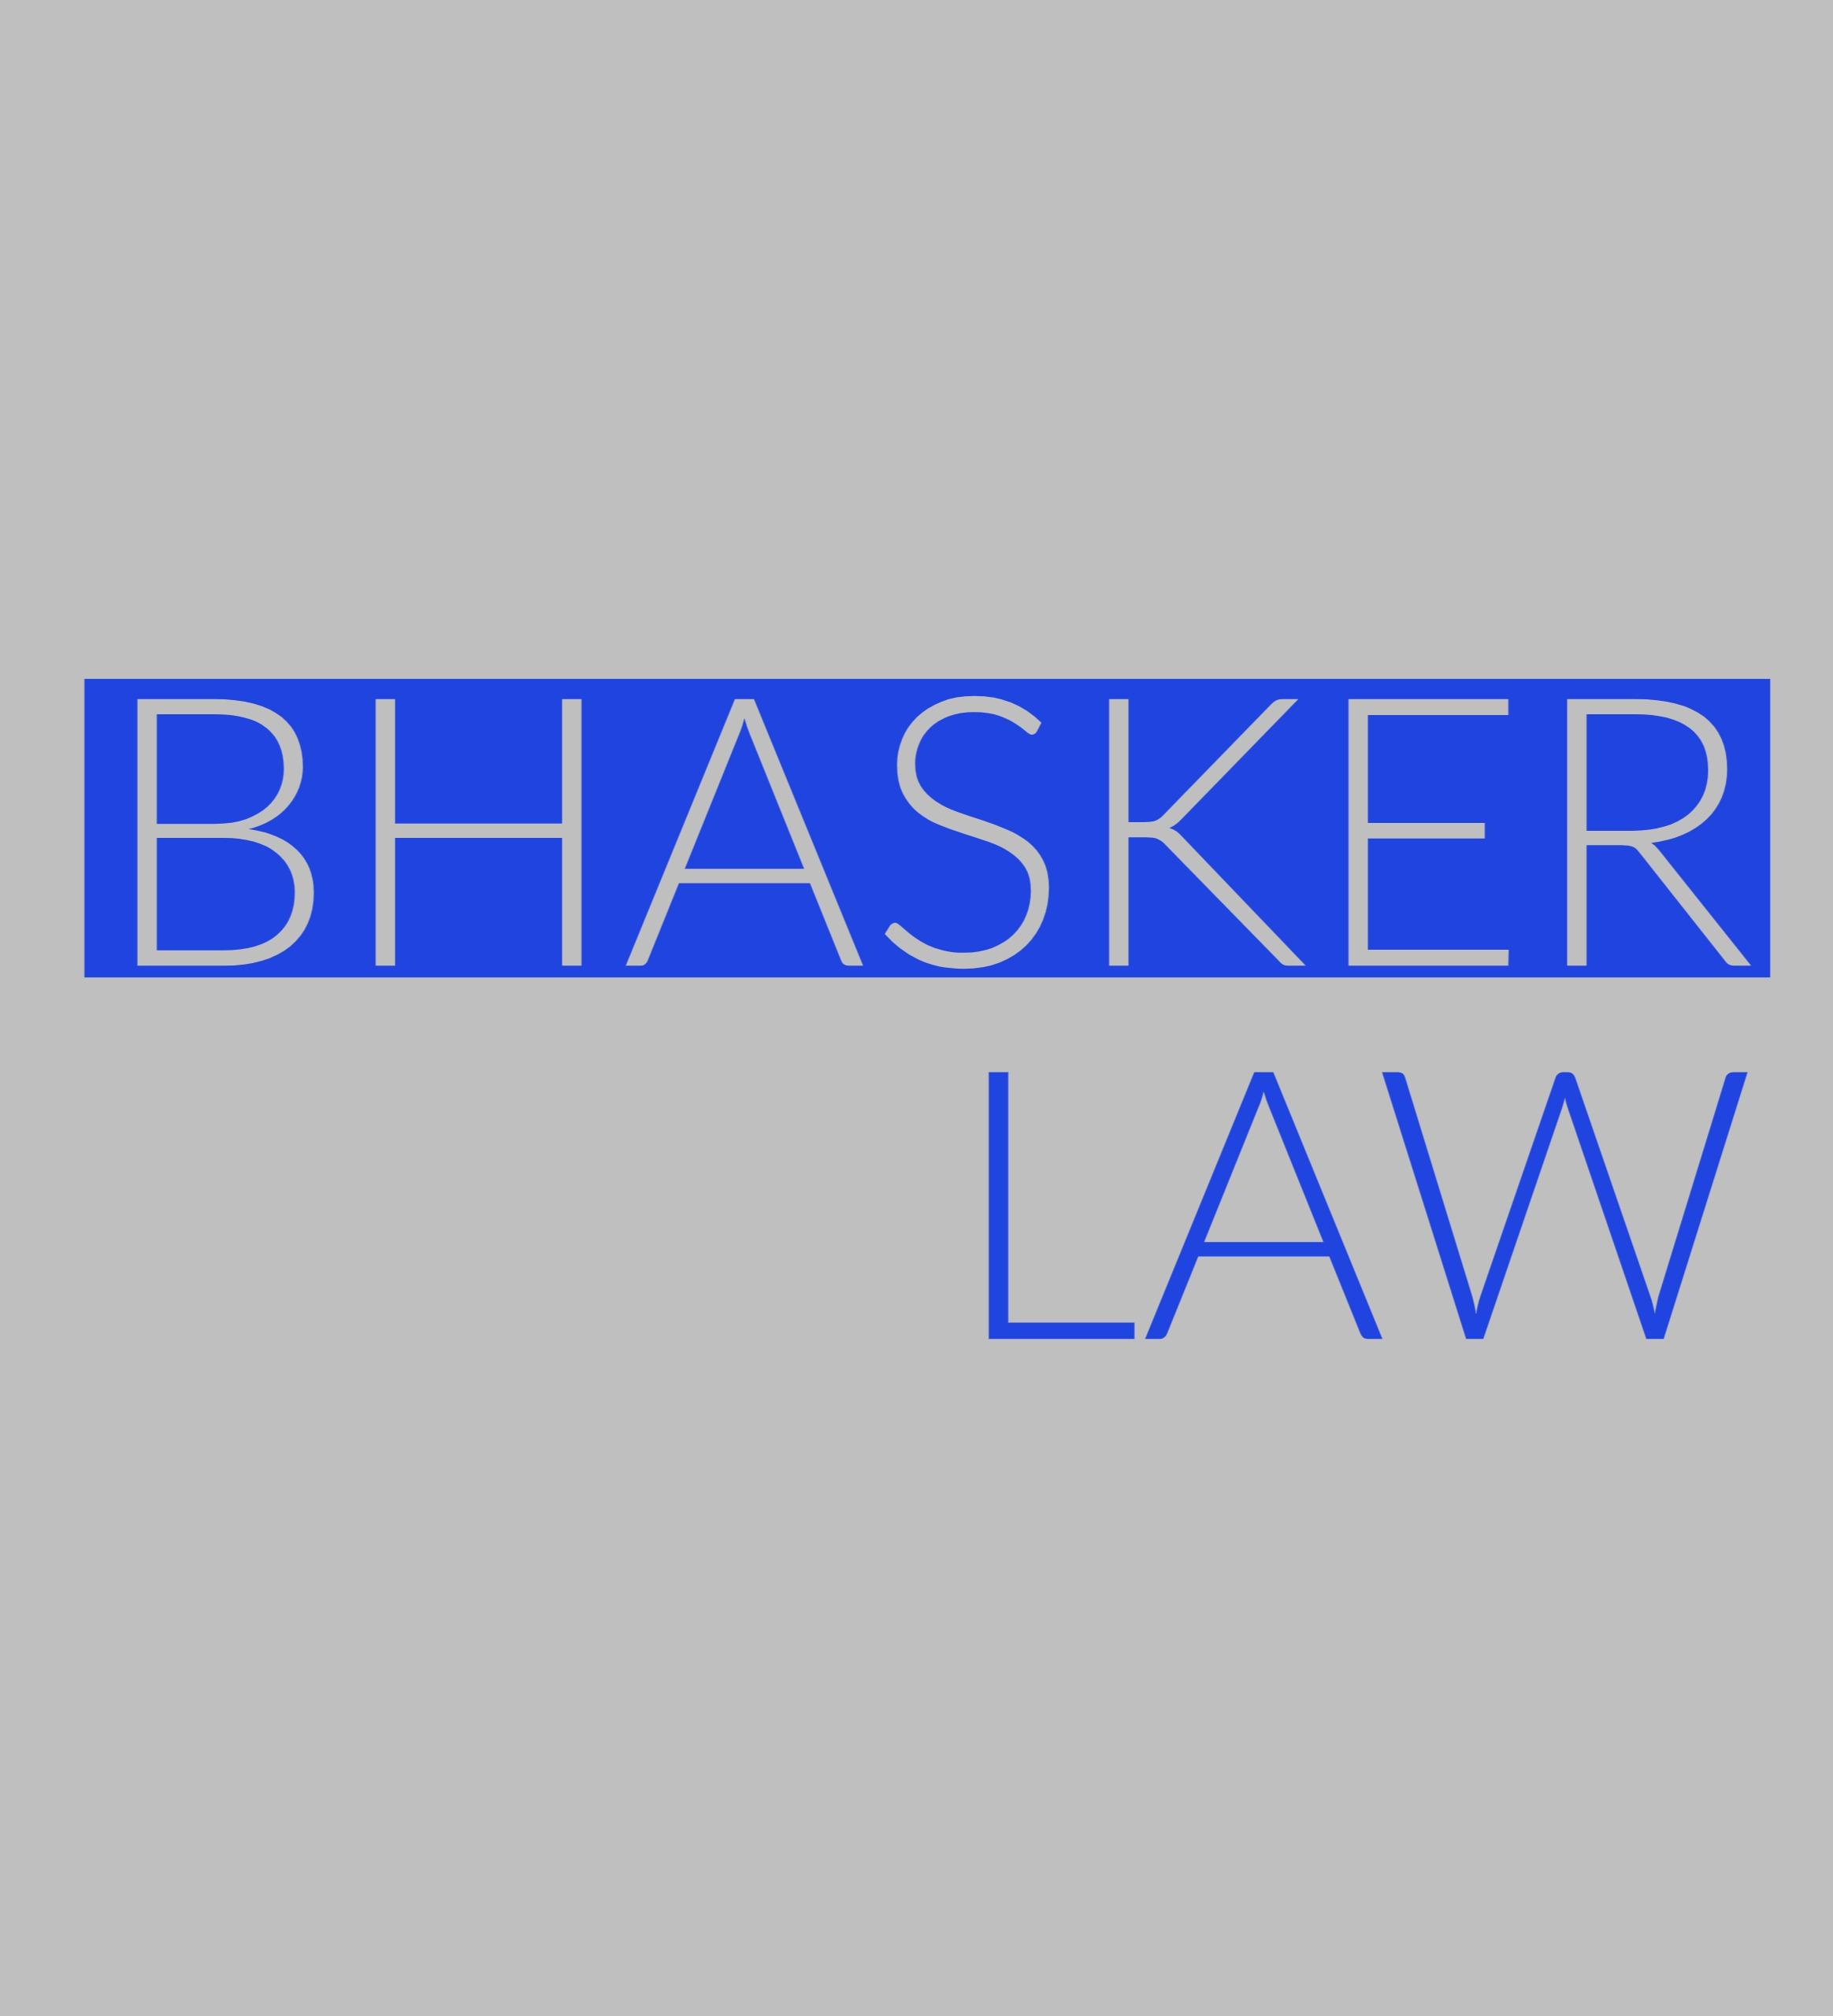 Kedar Bhasker's Profile Image